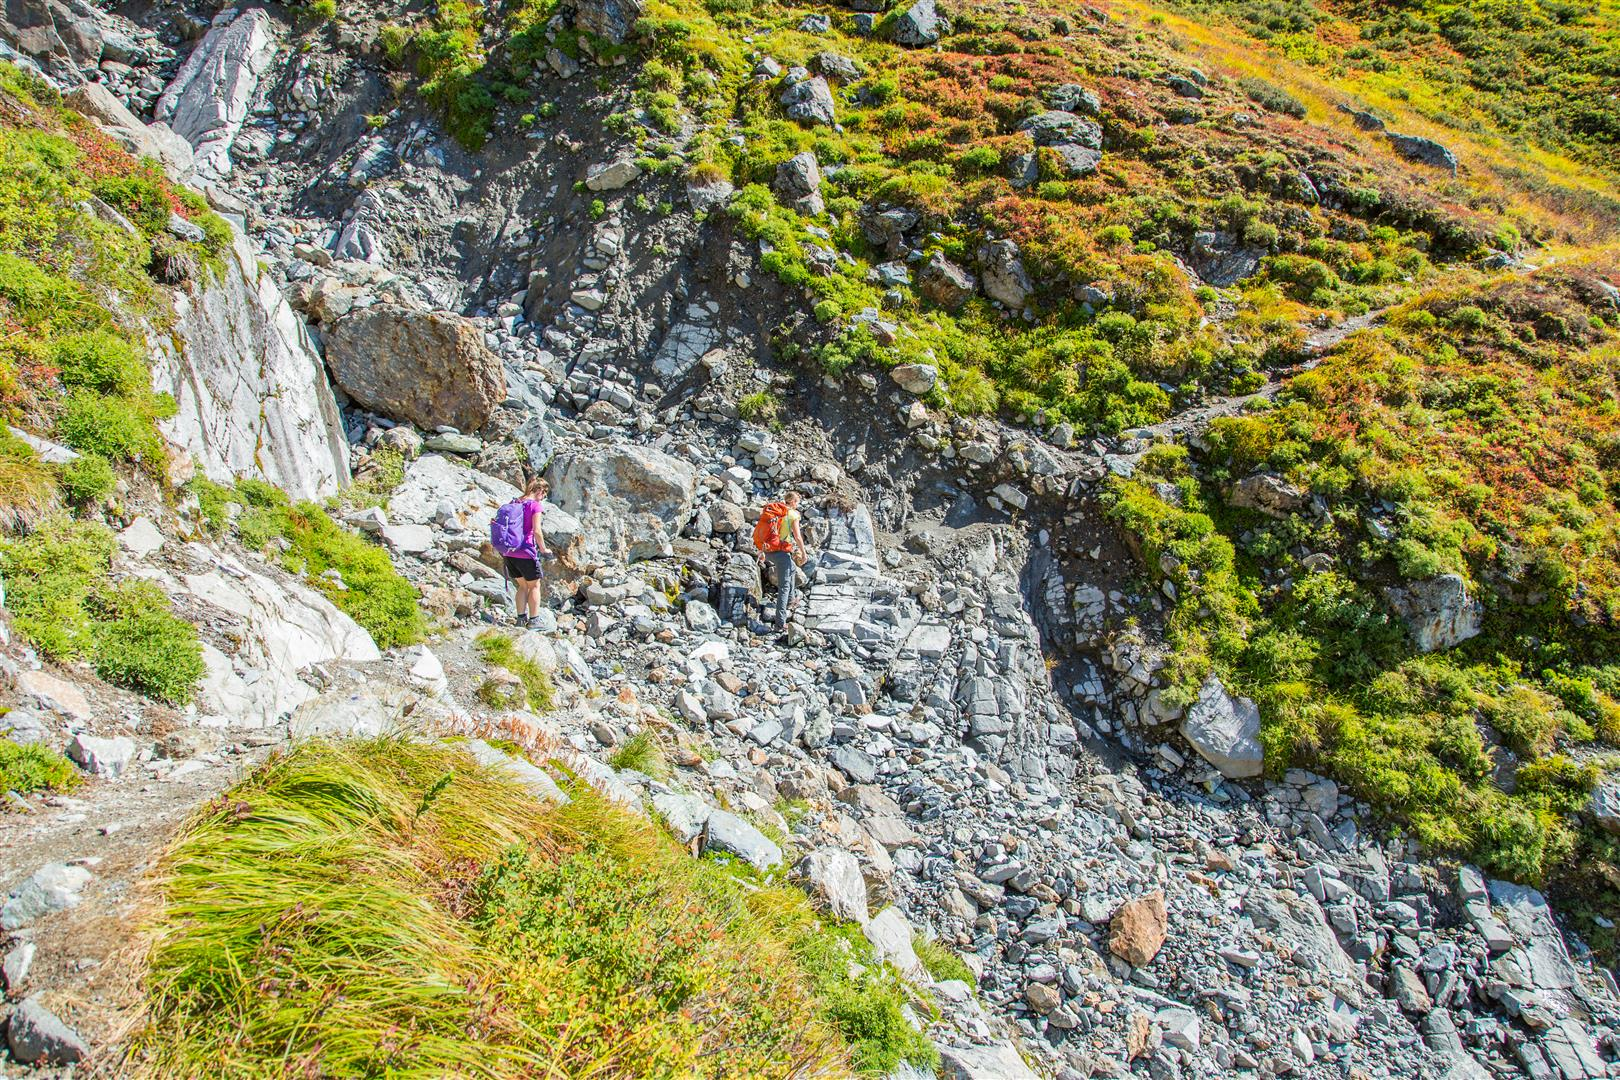 Crossing small boulder field